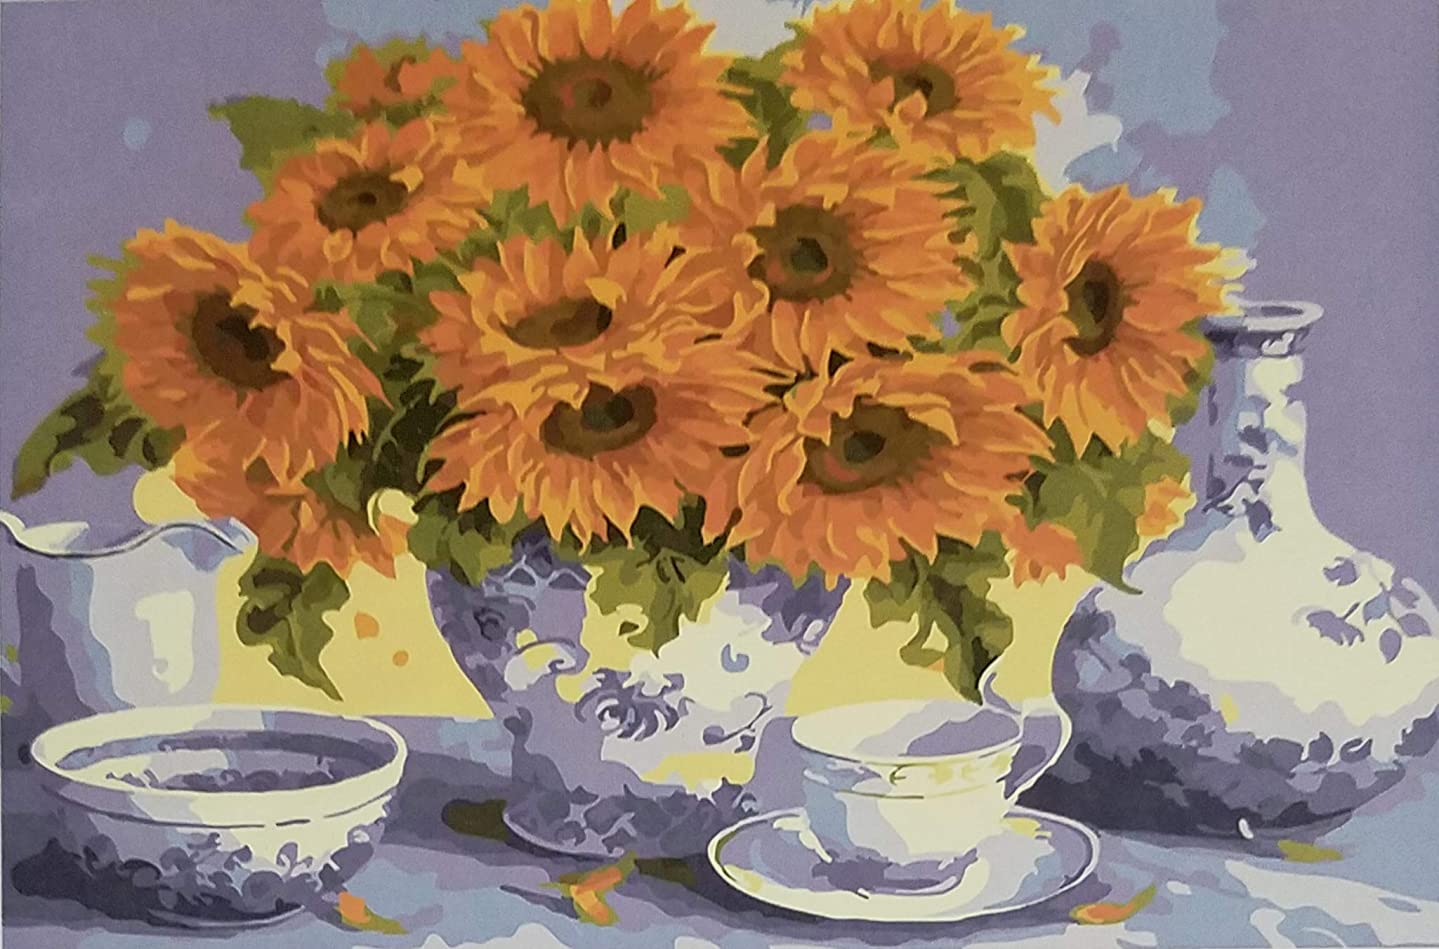 Imagine Micromosaics 5D DIY Full Square Drill 40 x 50 cm Mounted Diamond Painting Sunflowers